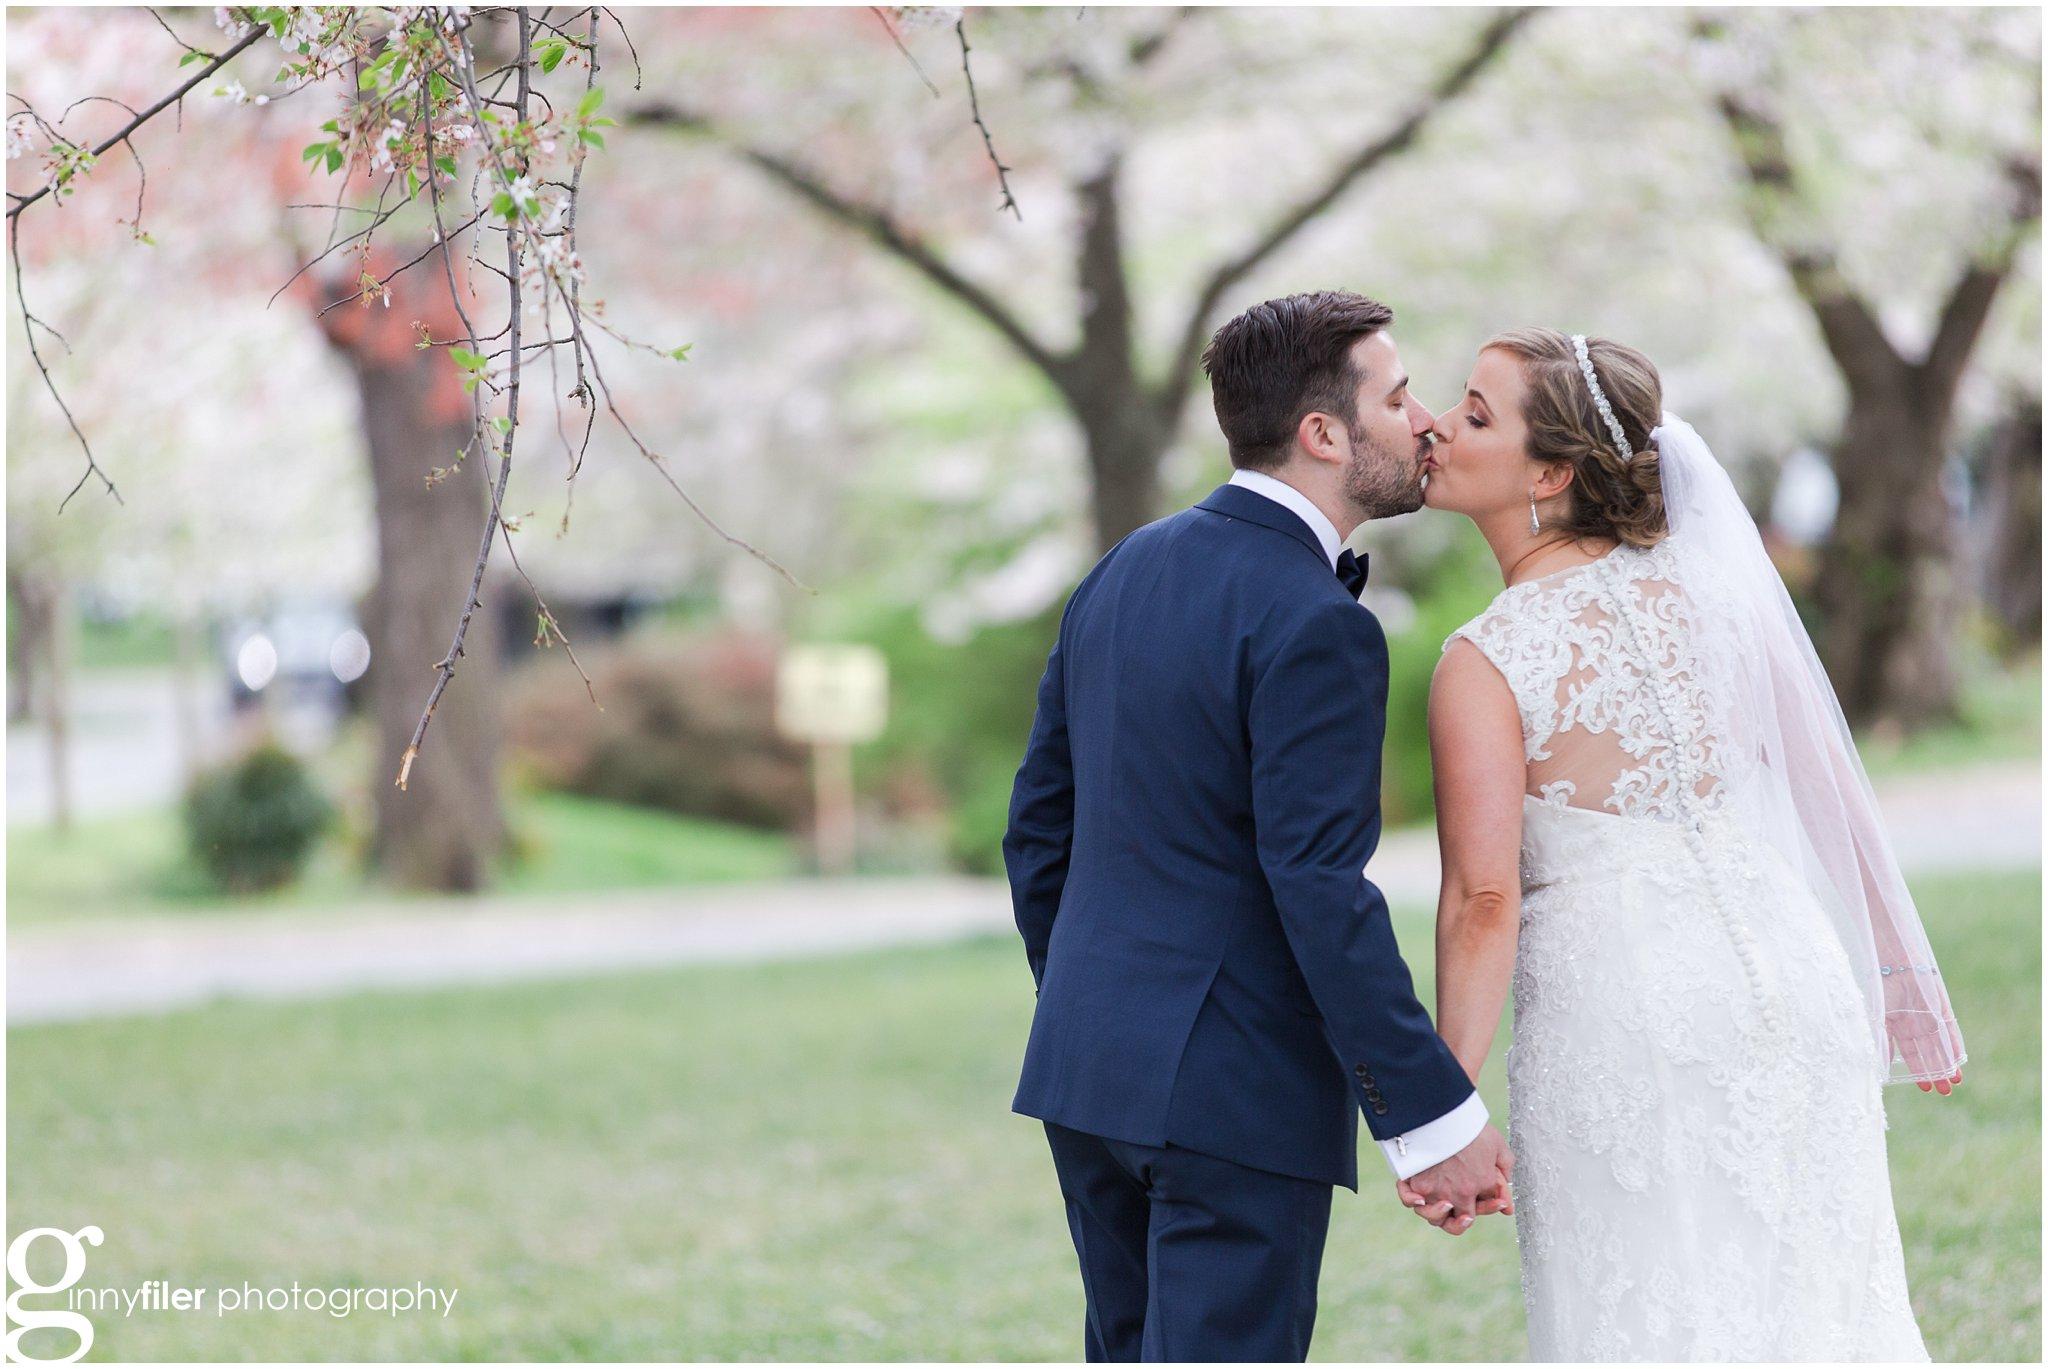 wedding_pink_spring_cherryblossoms_0151.jpg